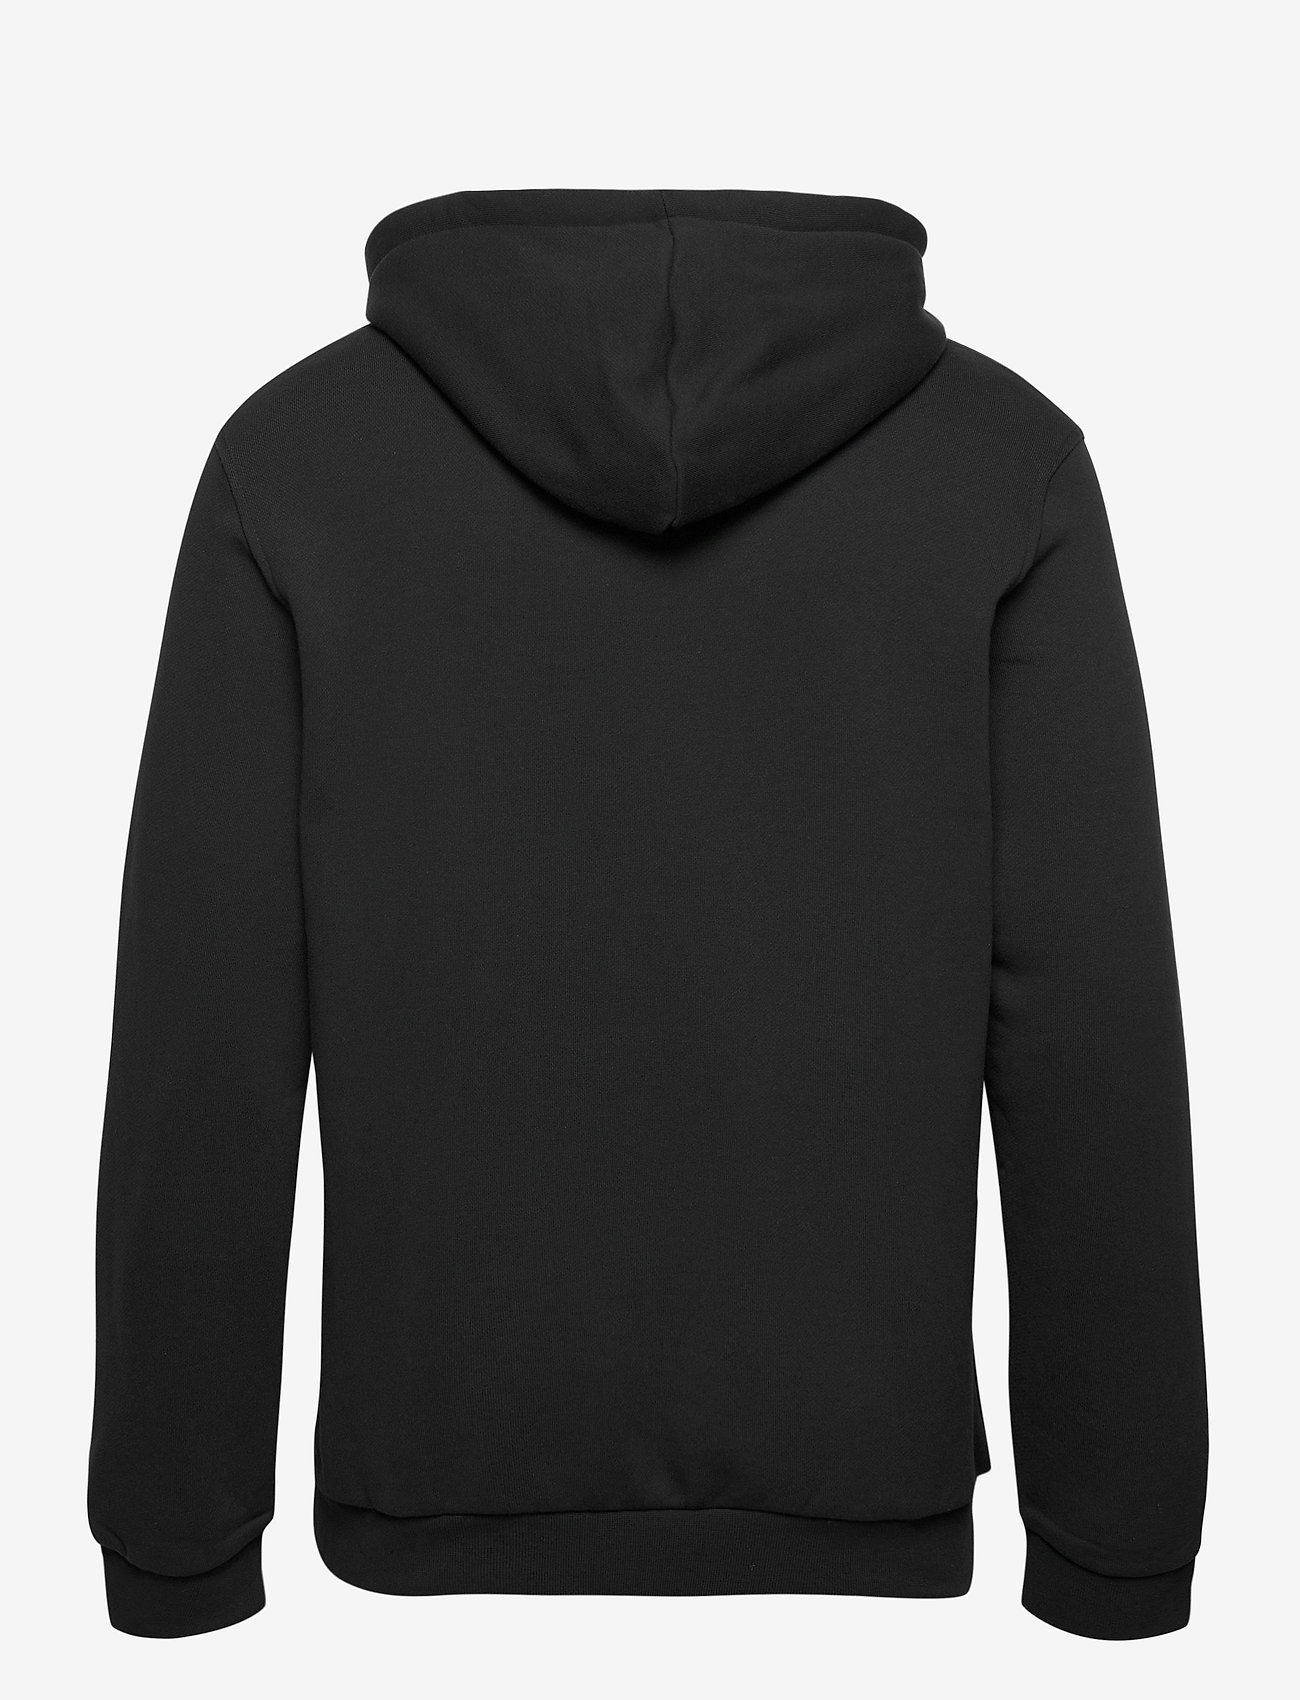 adidas Originals GOOFY HOODY - Sweatshirts BLACK/BLACK - Menn Klær